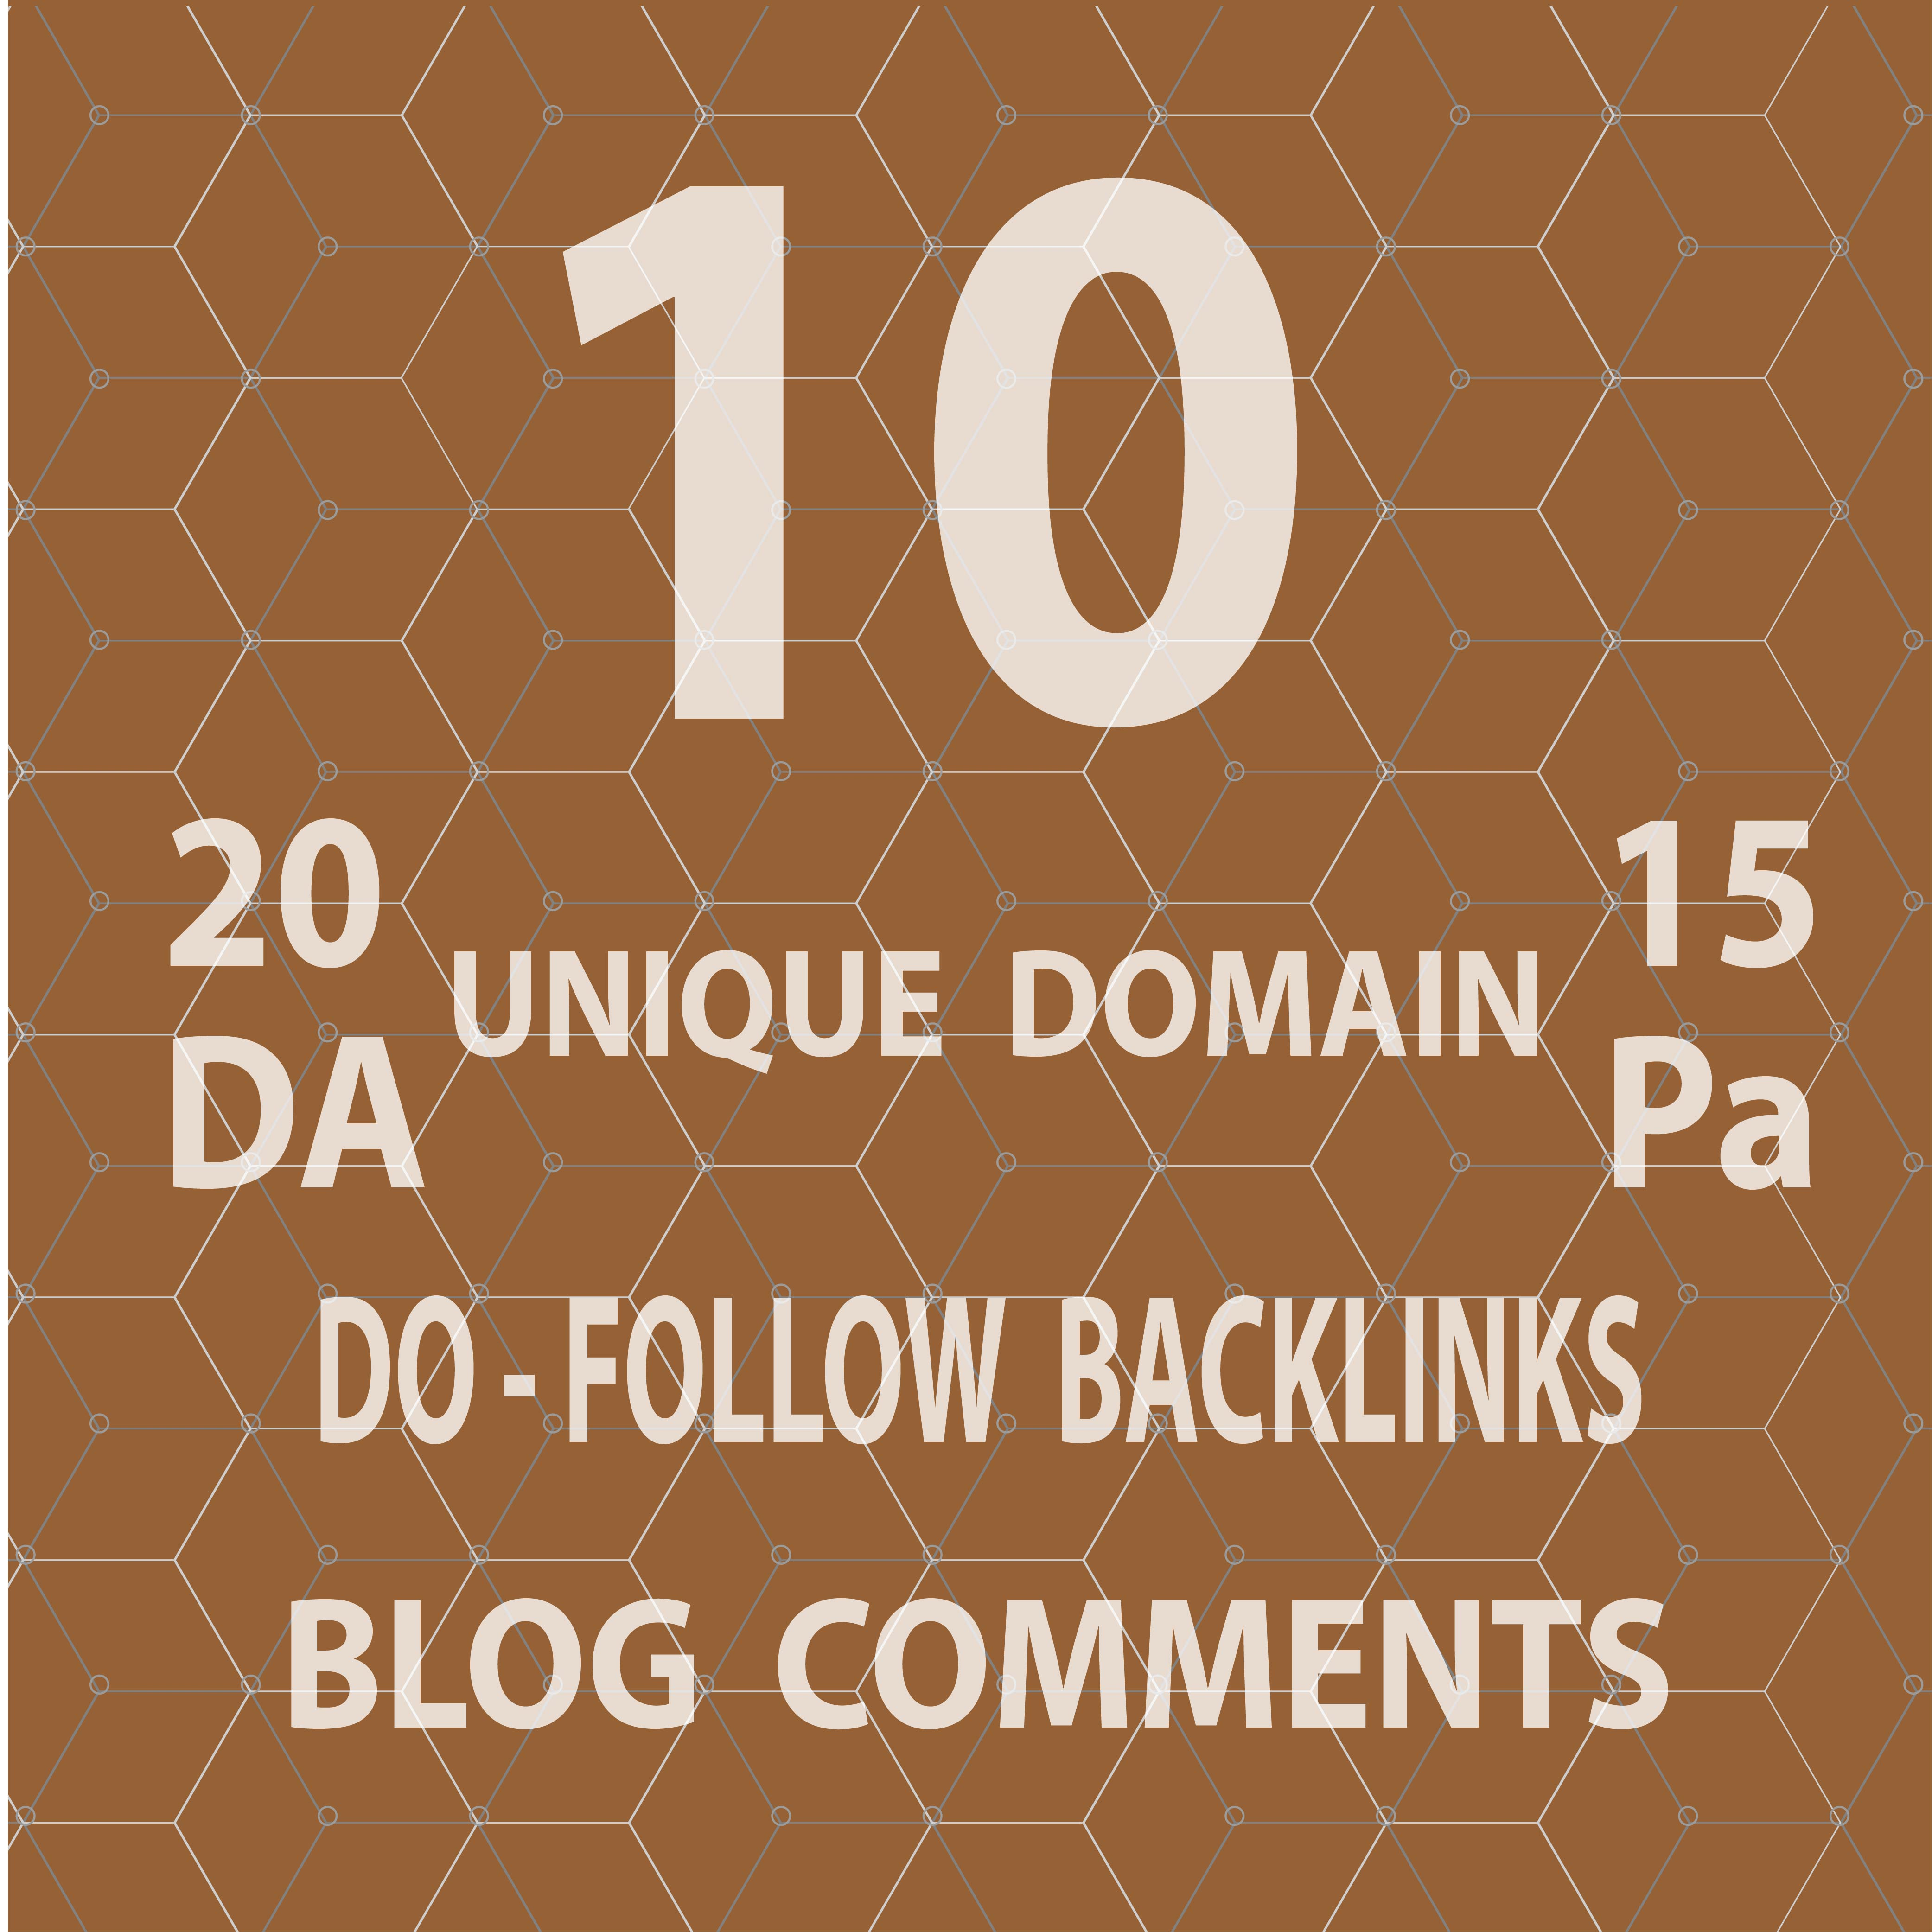 provide 10 unqiue domain dofollow blog comments with high da pa